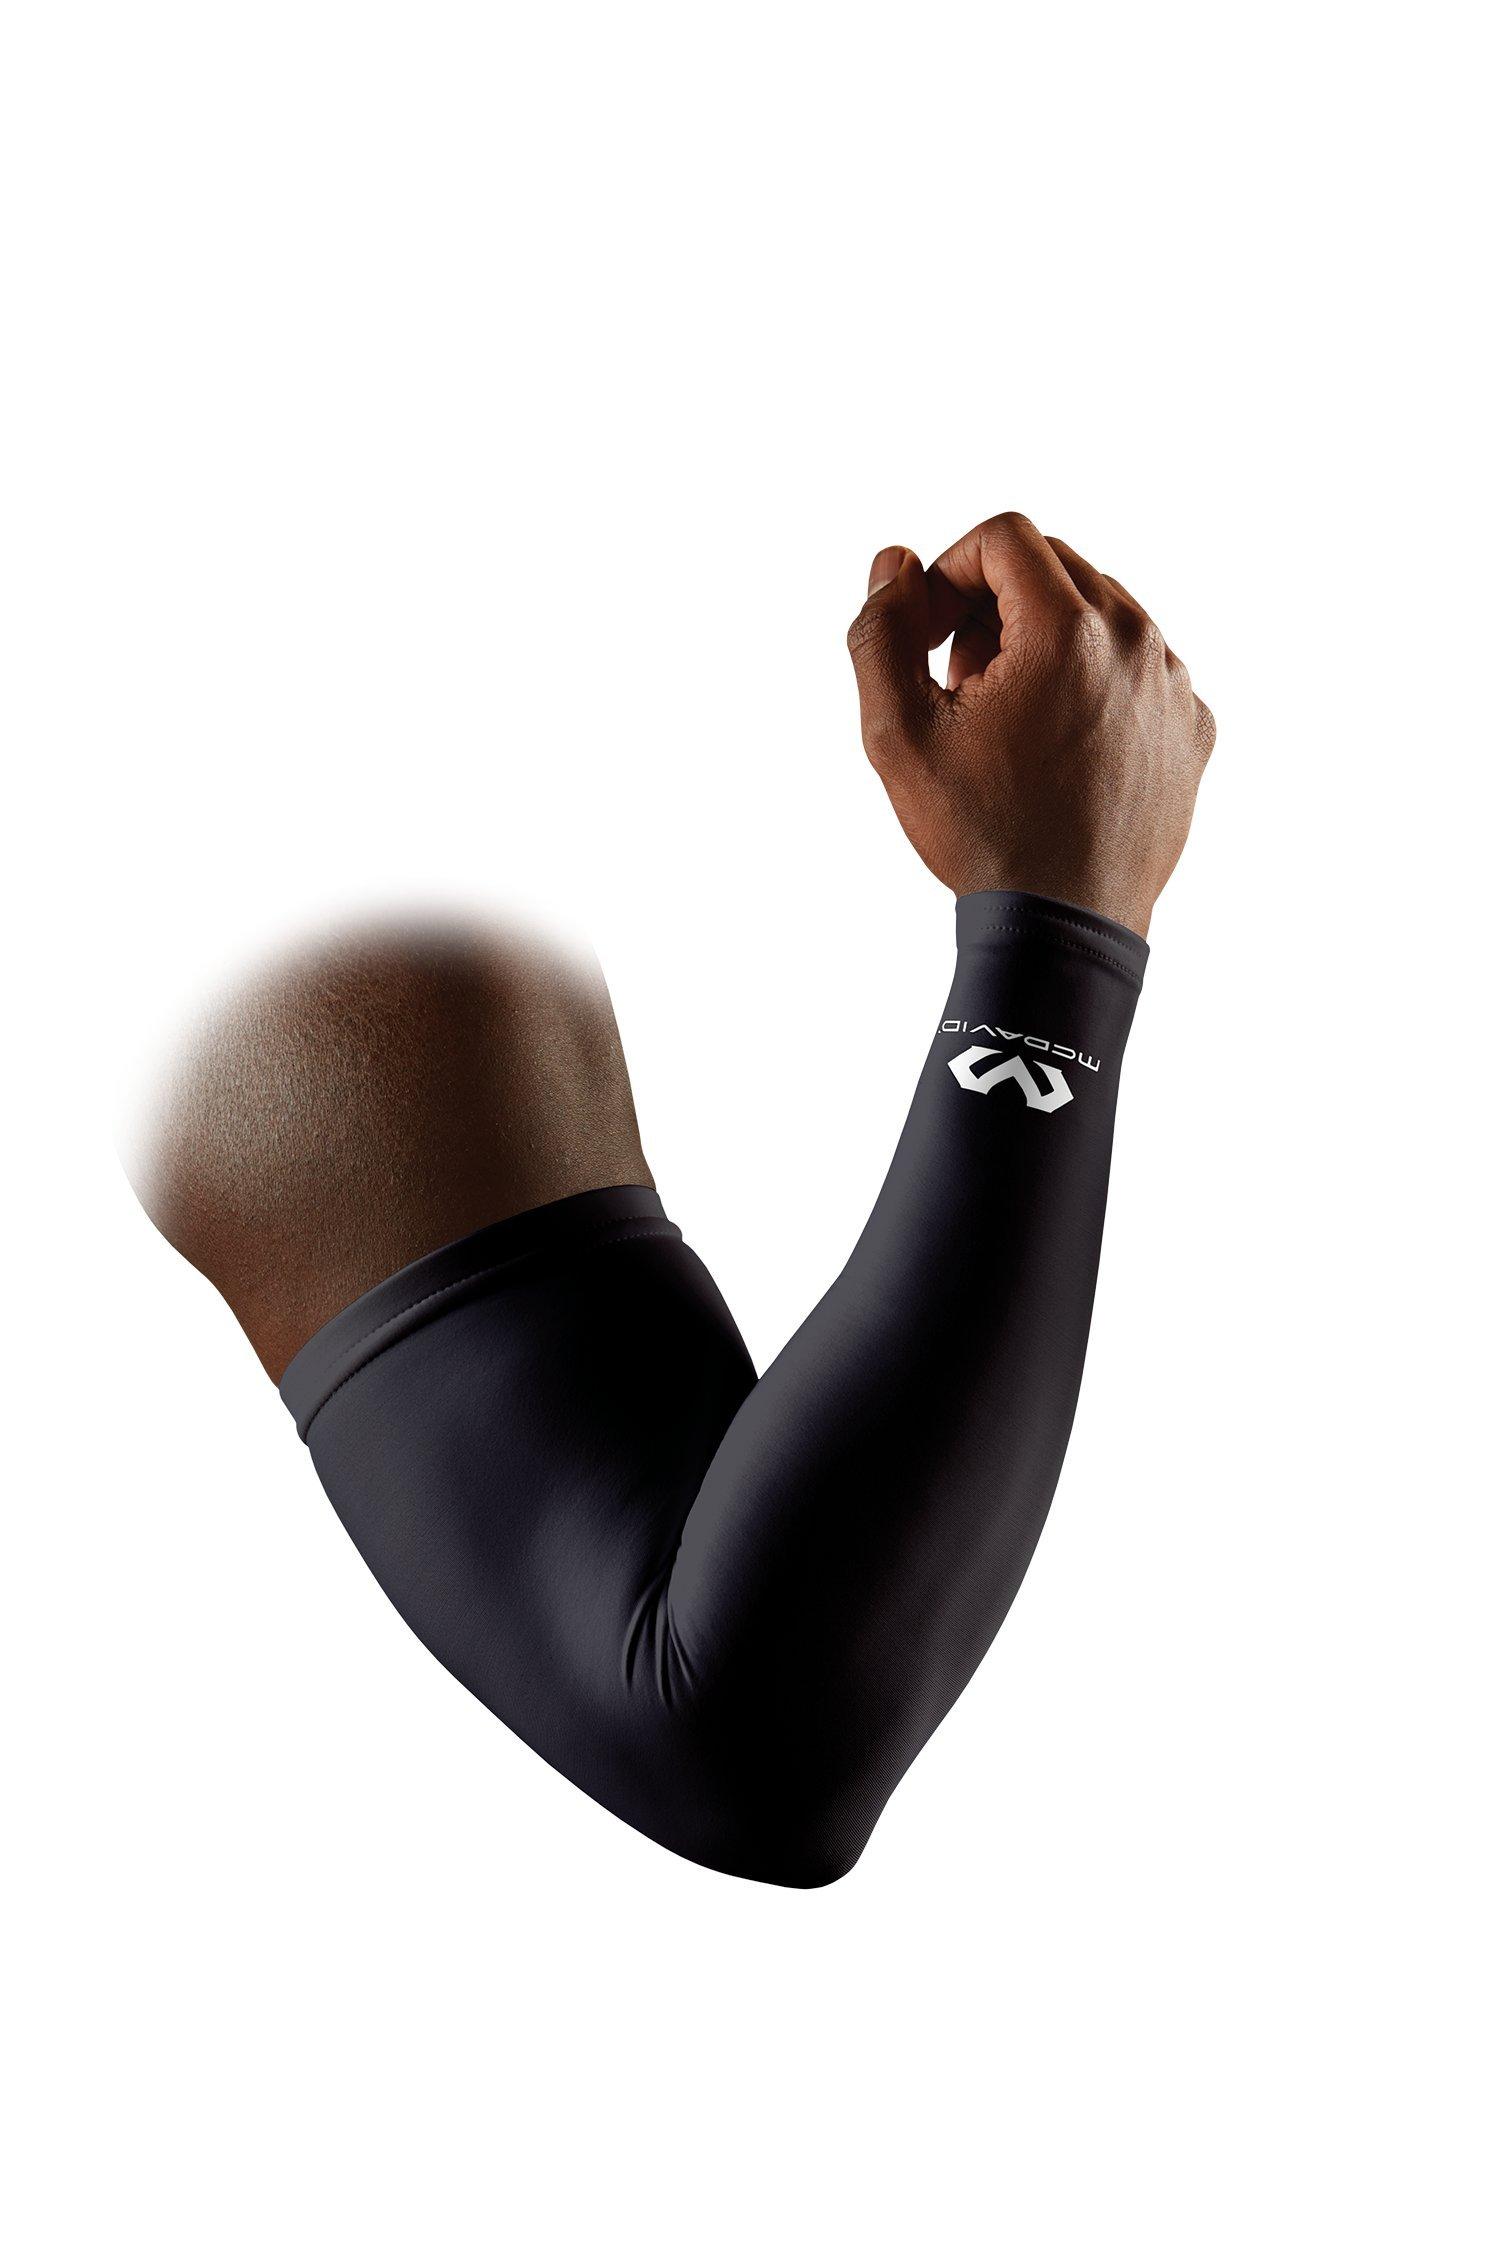 McDavid Compression Arm Sleeve, 50+ UV Skin Protection, Cooling Arm Sleeve for Sports, Running, Basketball, Baseball, Football